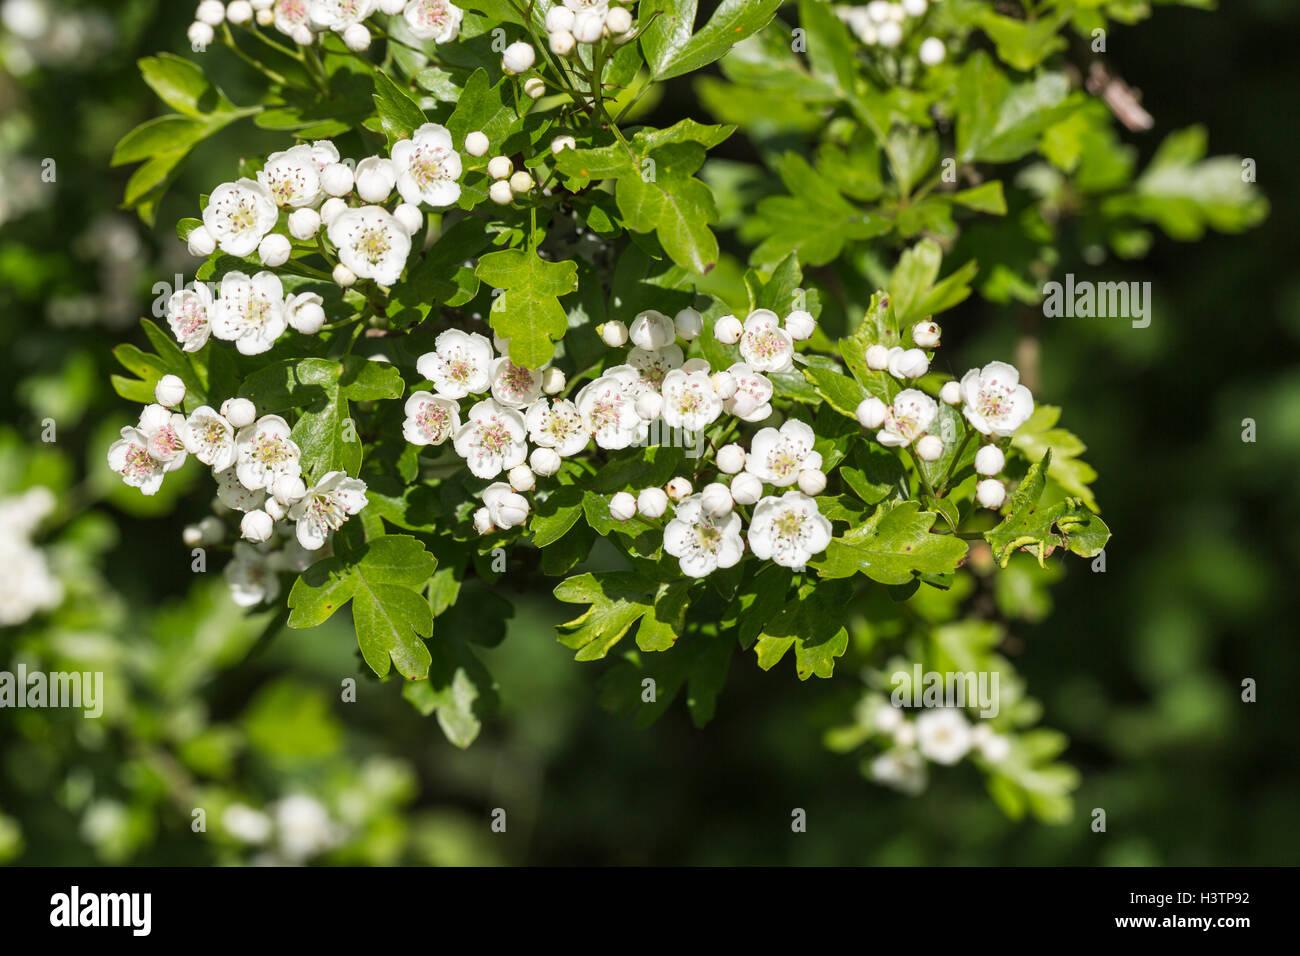 Hawthorn or may tree crataegus white flowers in spring surrey hawthorn or may tree crataegus white flowers in spring surrey uk mightylinksfo Choice Image